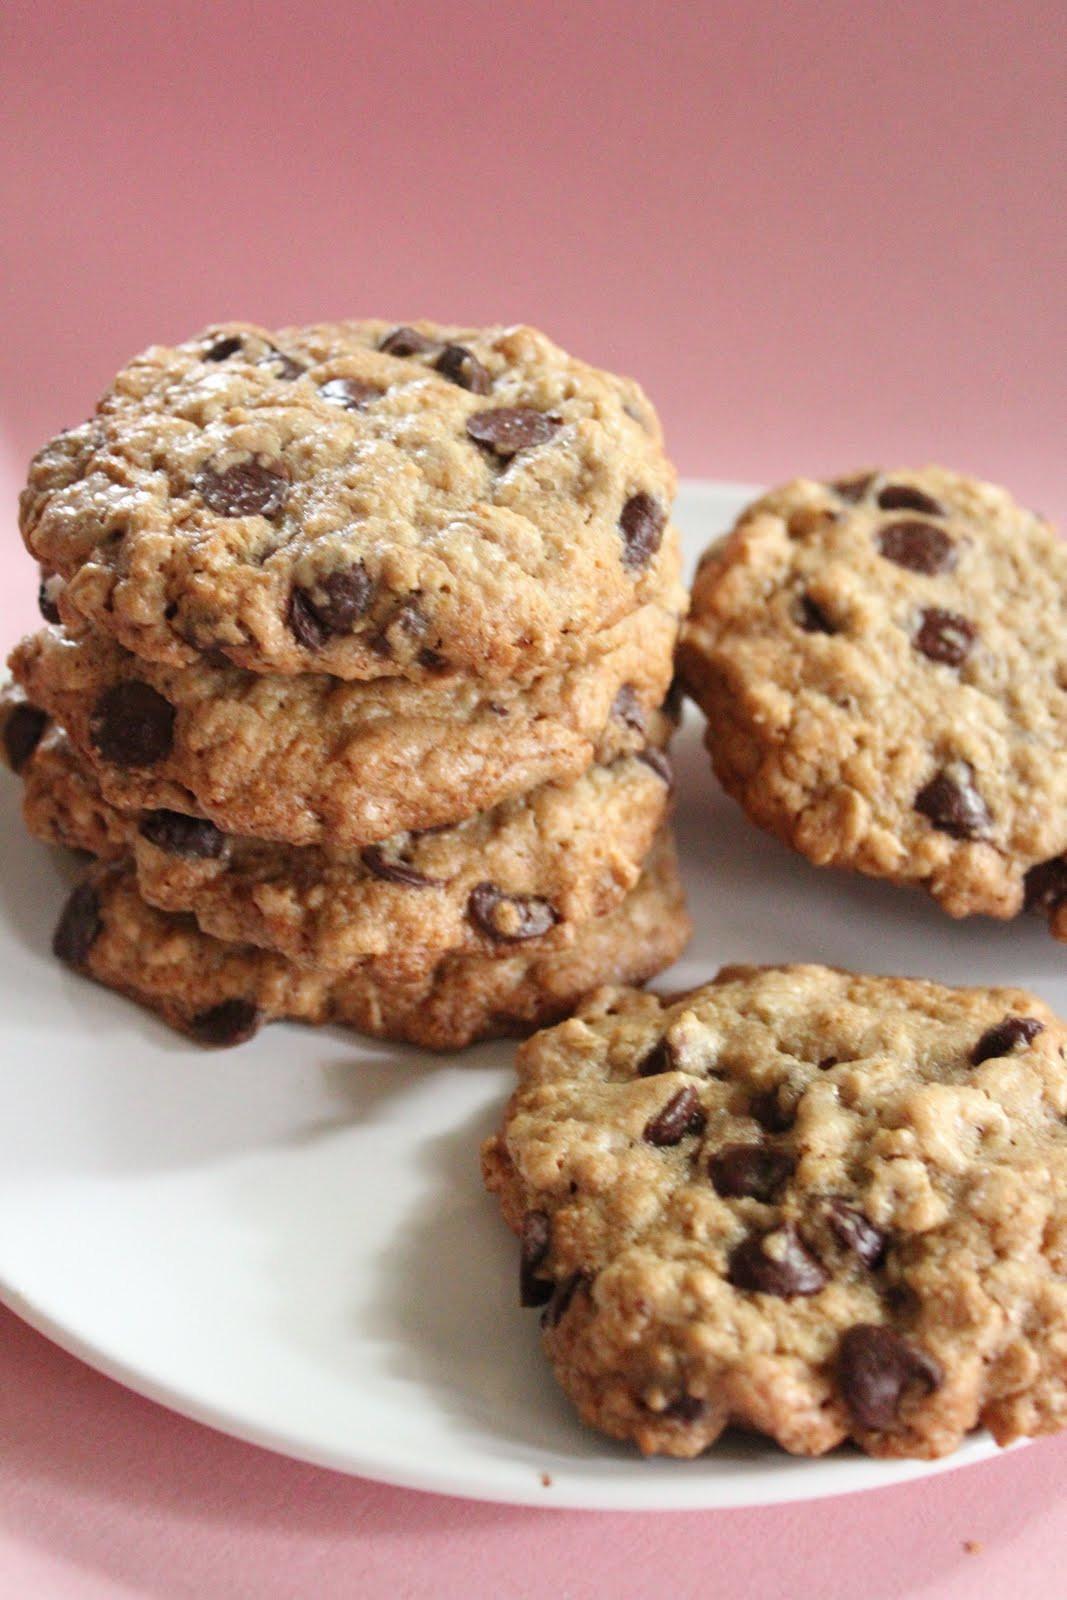 Healthy Oatmeal Raisin Chocolate Chip Cookies  Ultimate healthier oatmeal and chocolate chip cookies